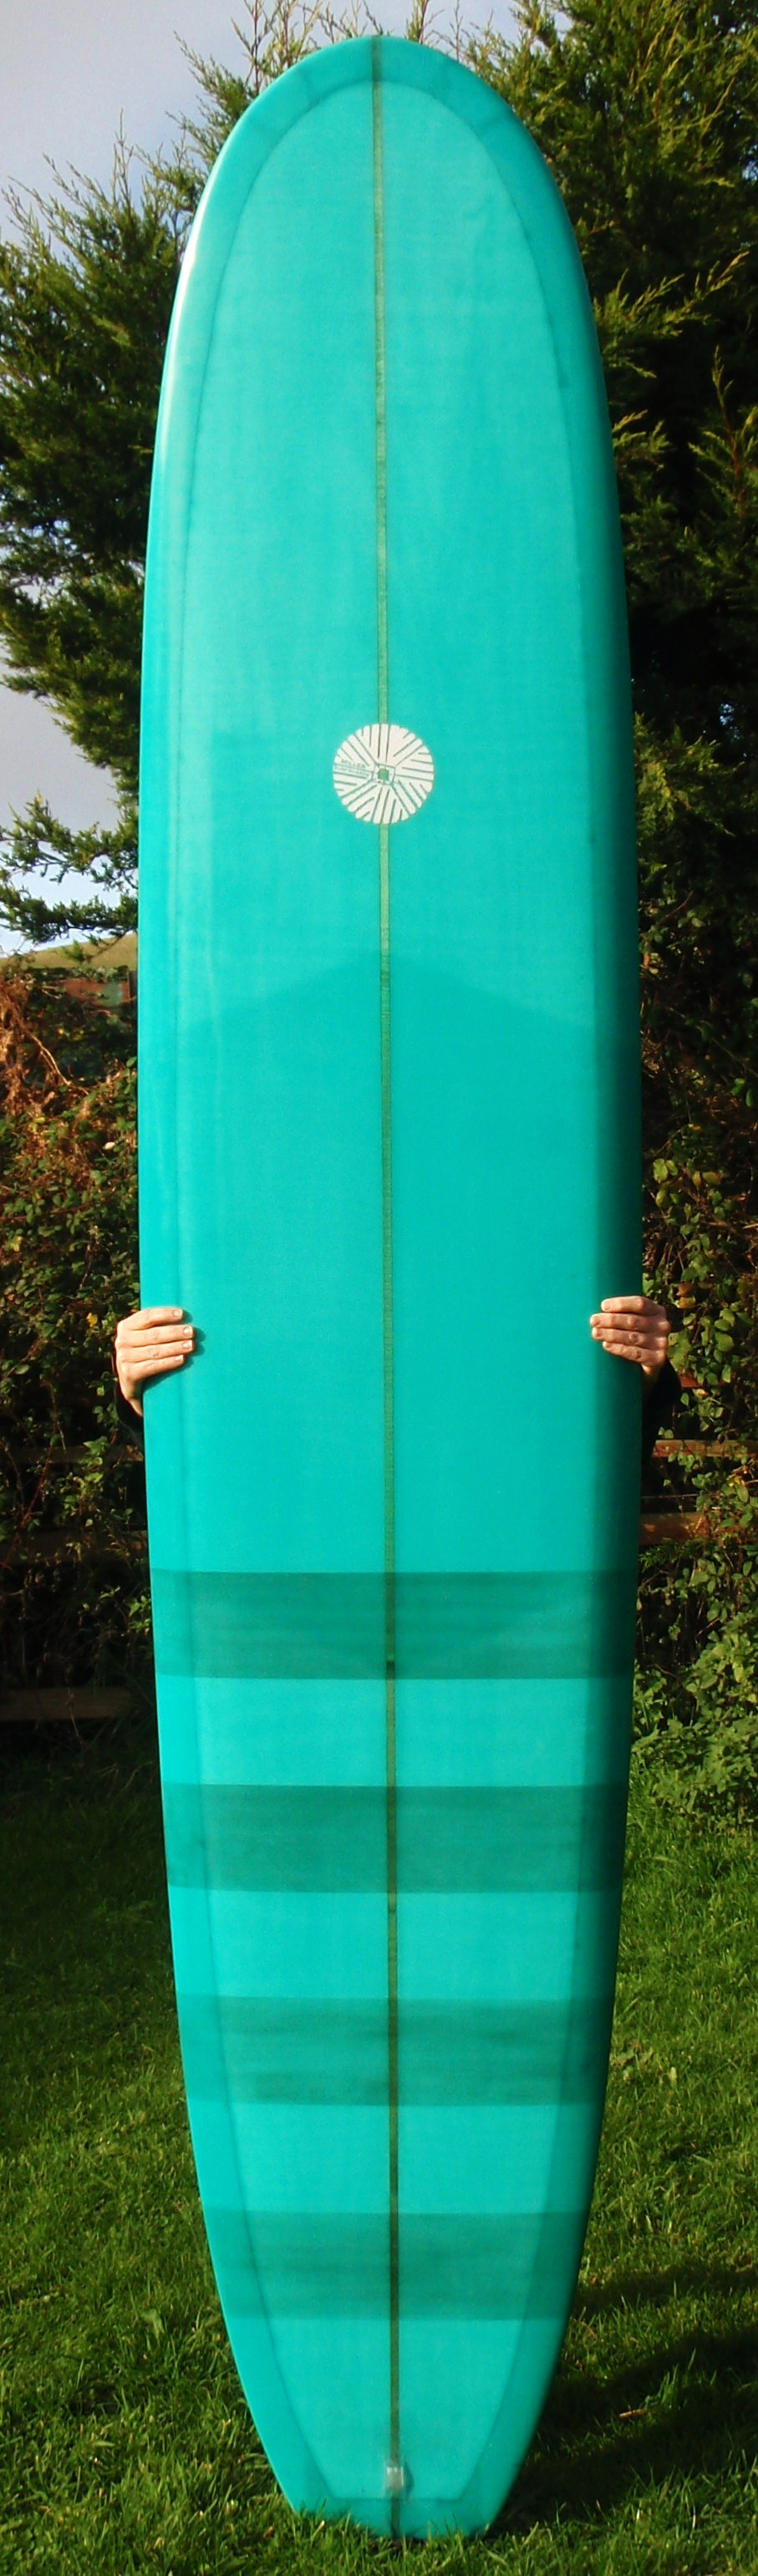 Miller Surfboards